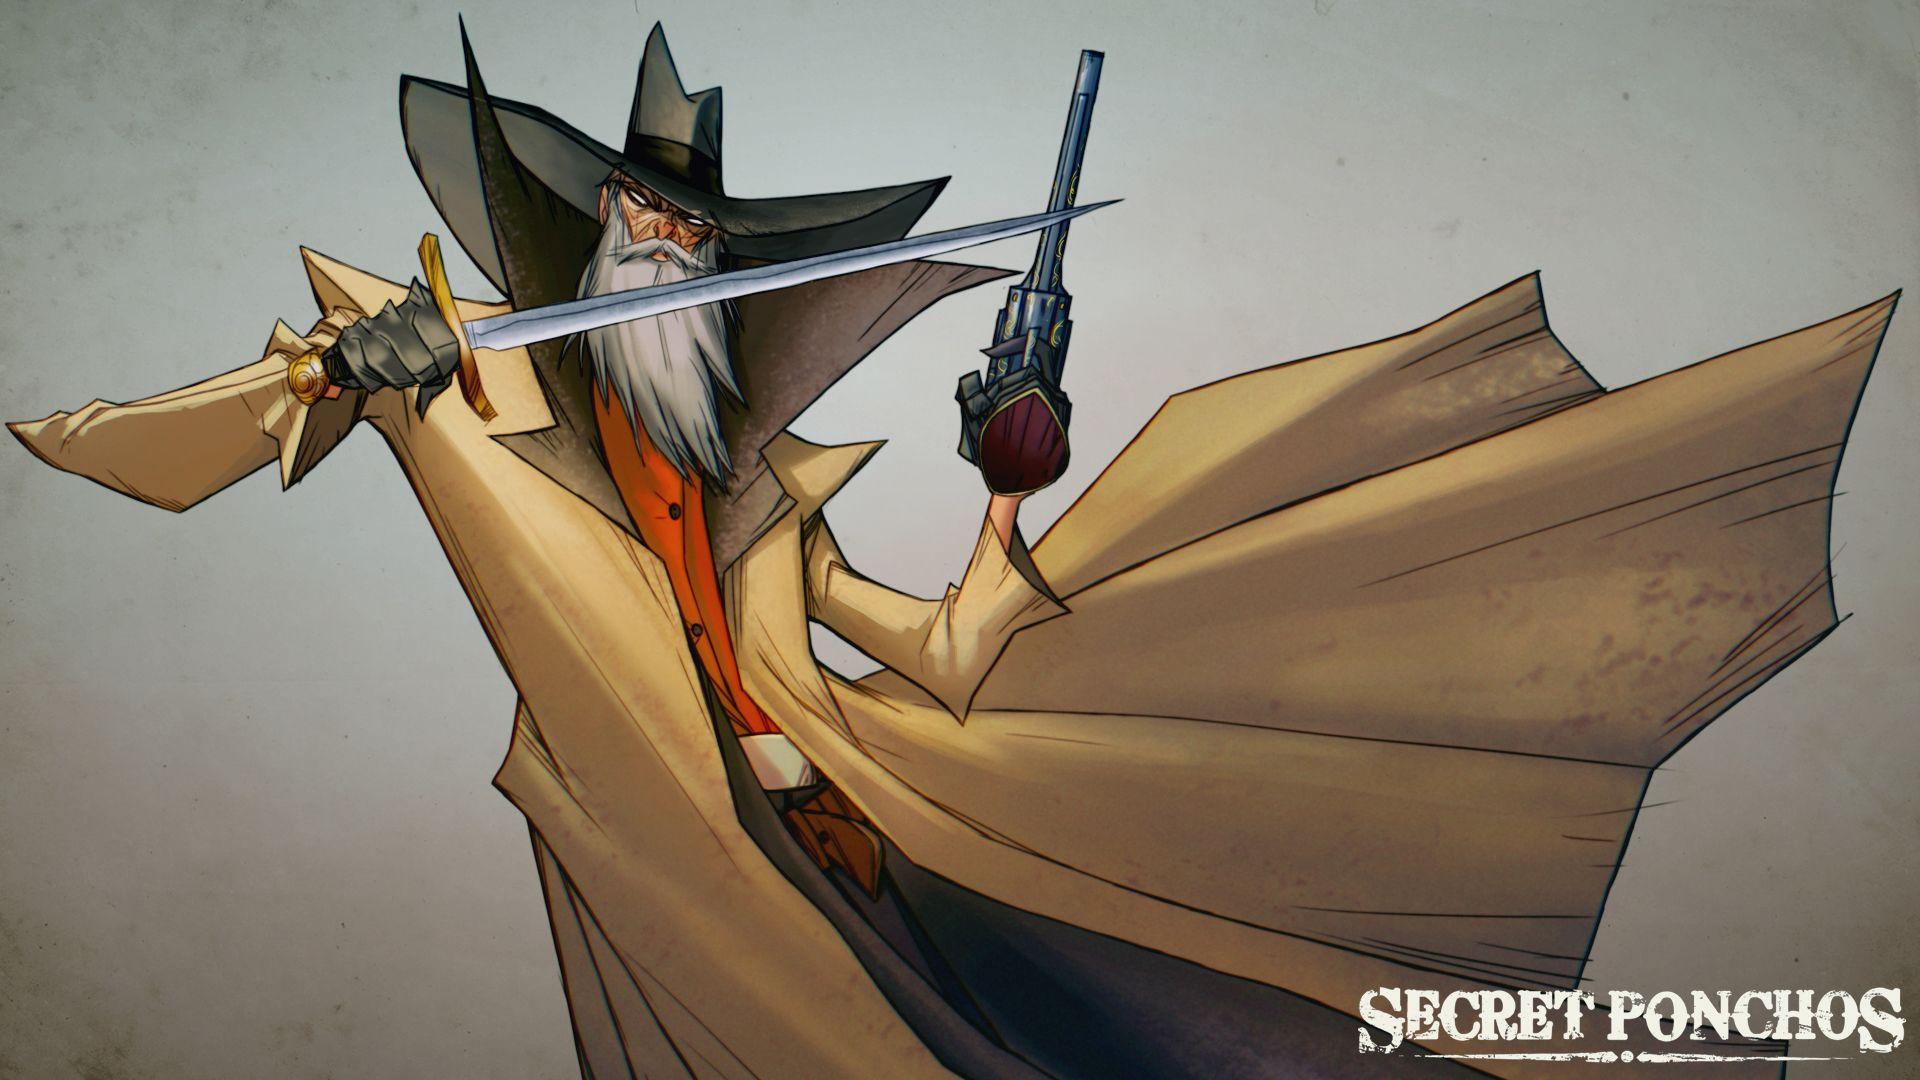 Secret Ponchos. The Killer